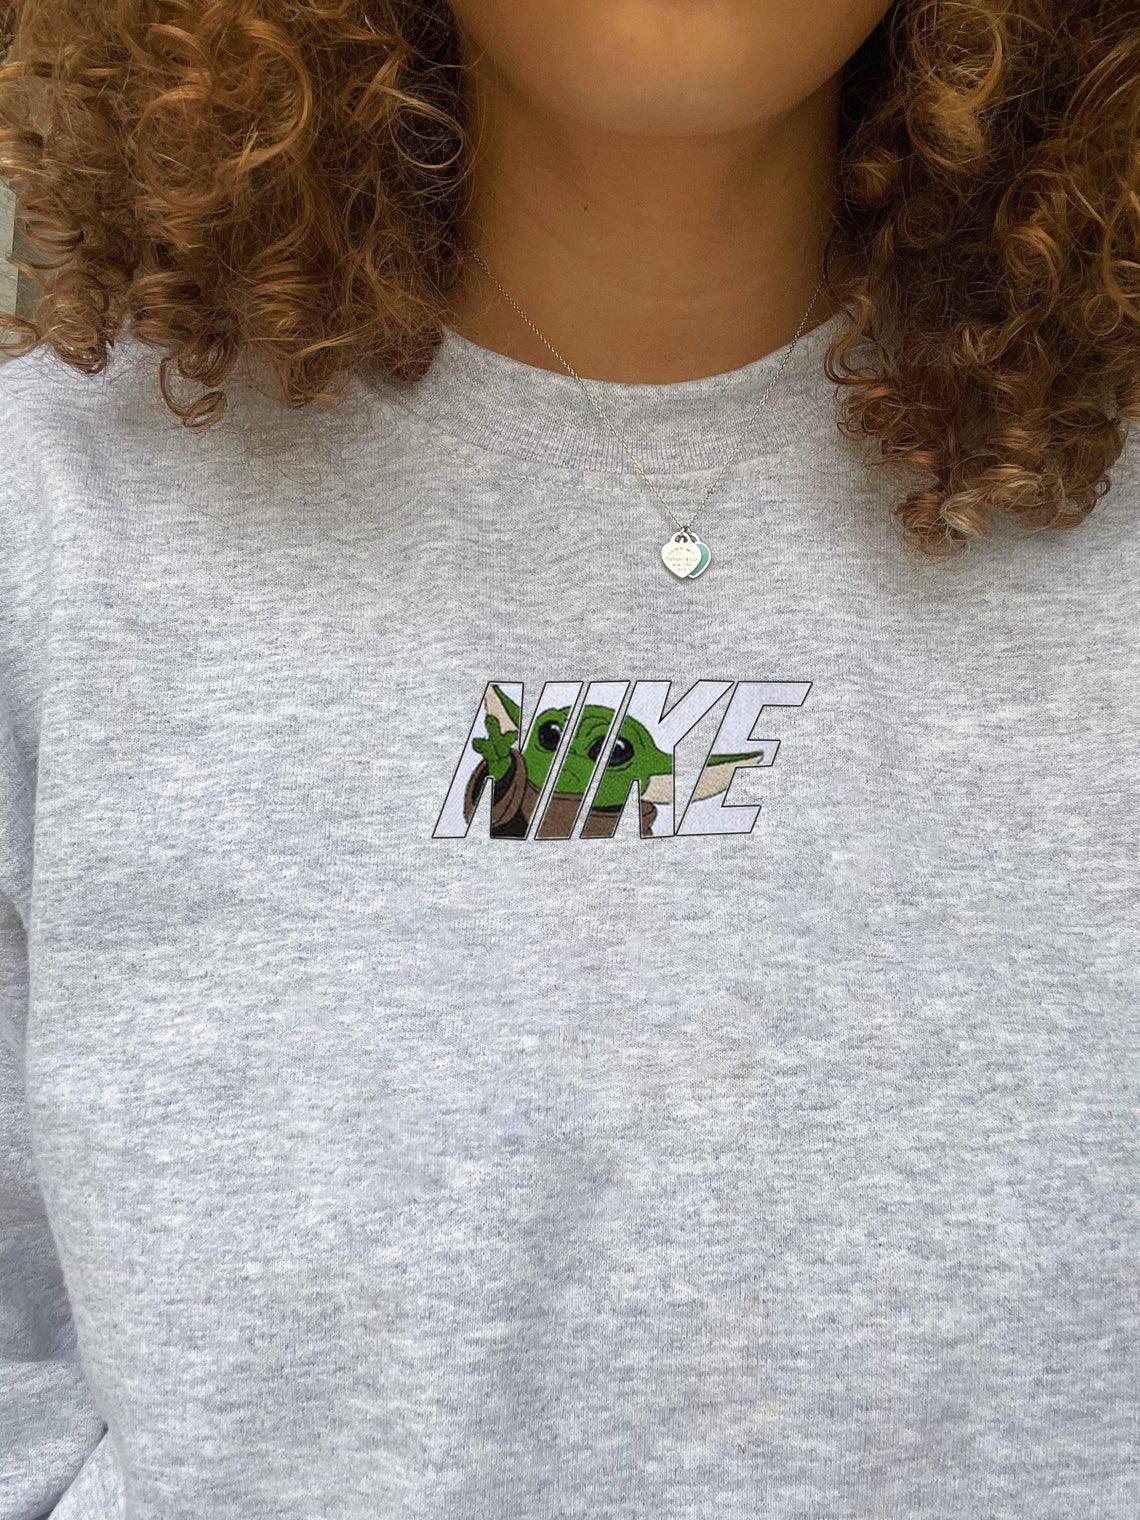 Baby Yoda Embroidered Swoosh Sweatshirt/t-shirt/hoodie Embroidery